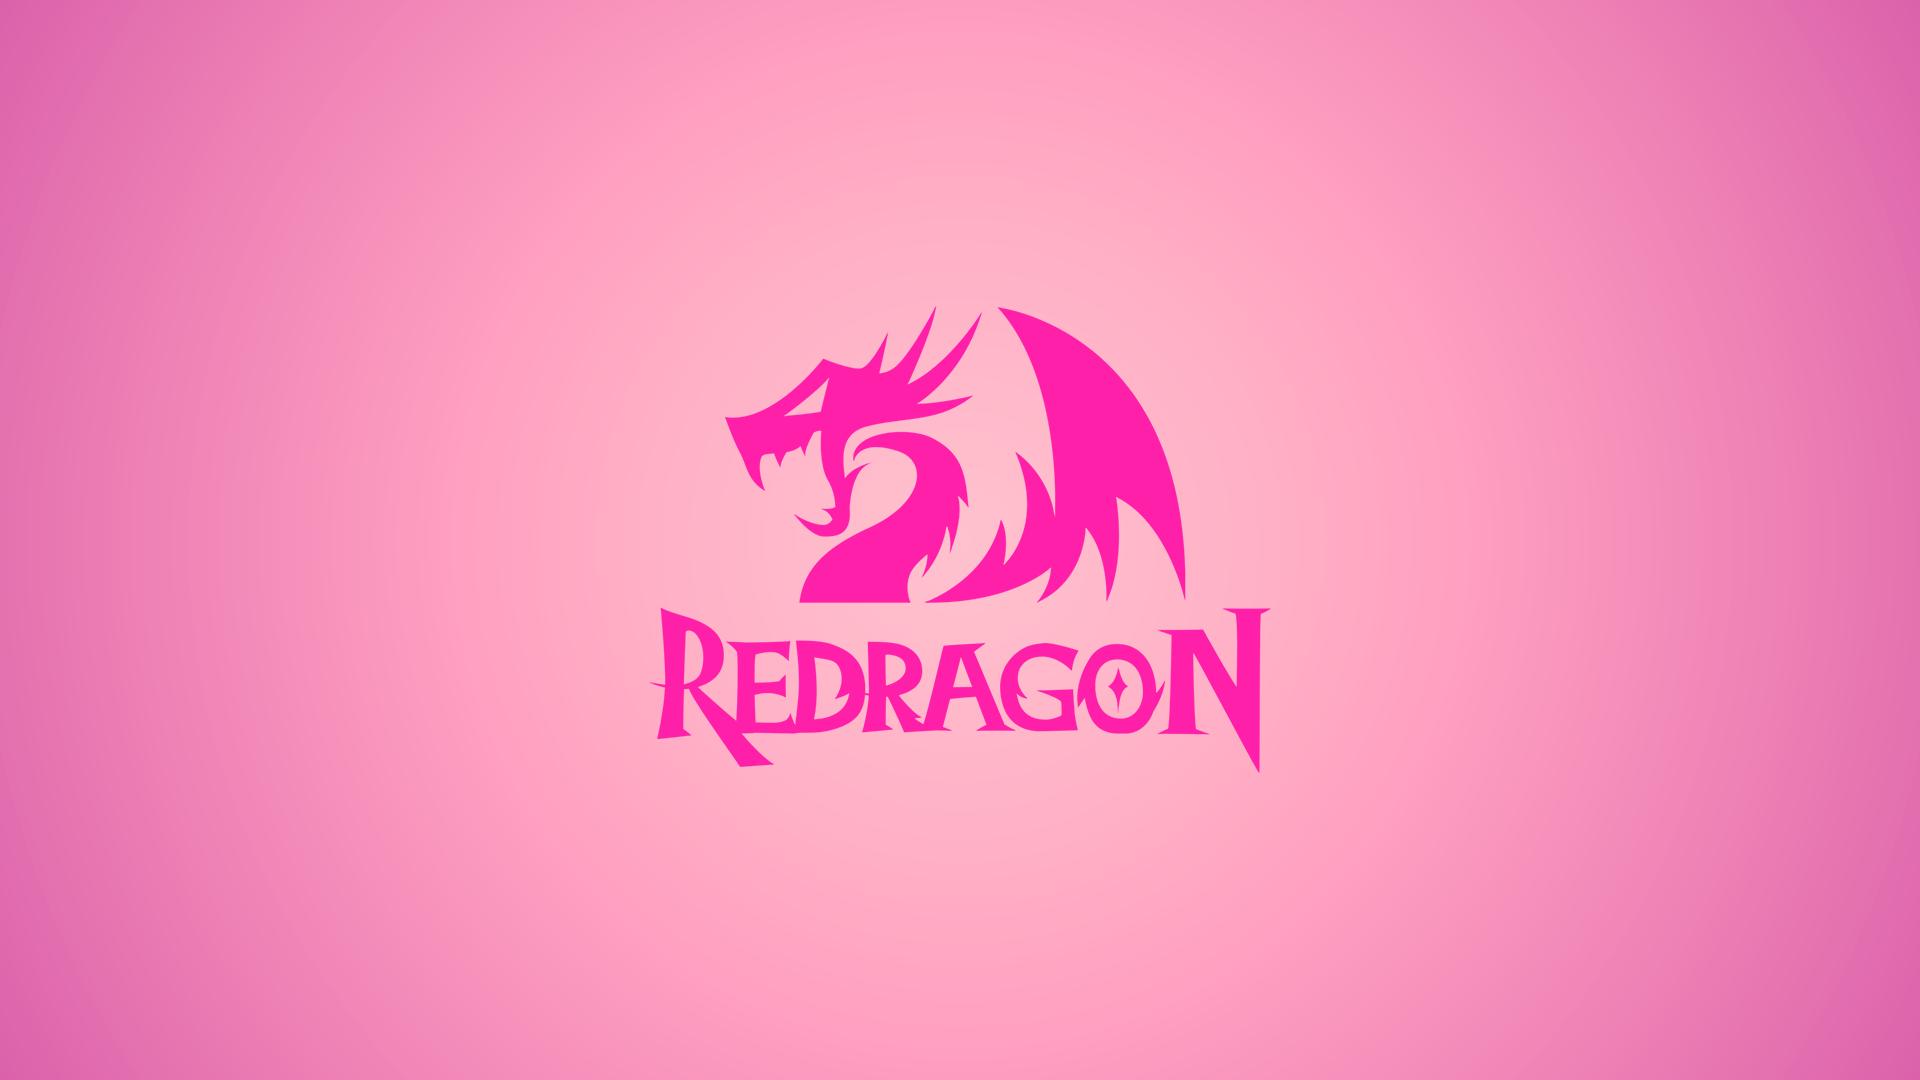 Wallpaper Redragon - Pink